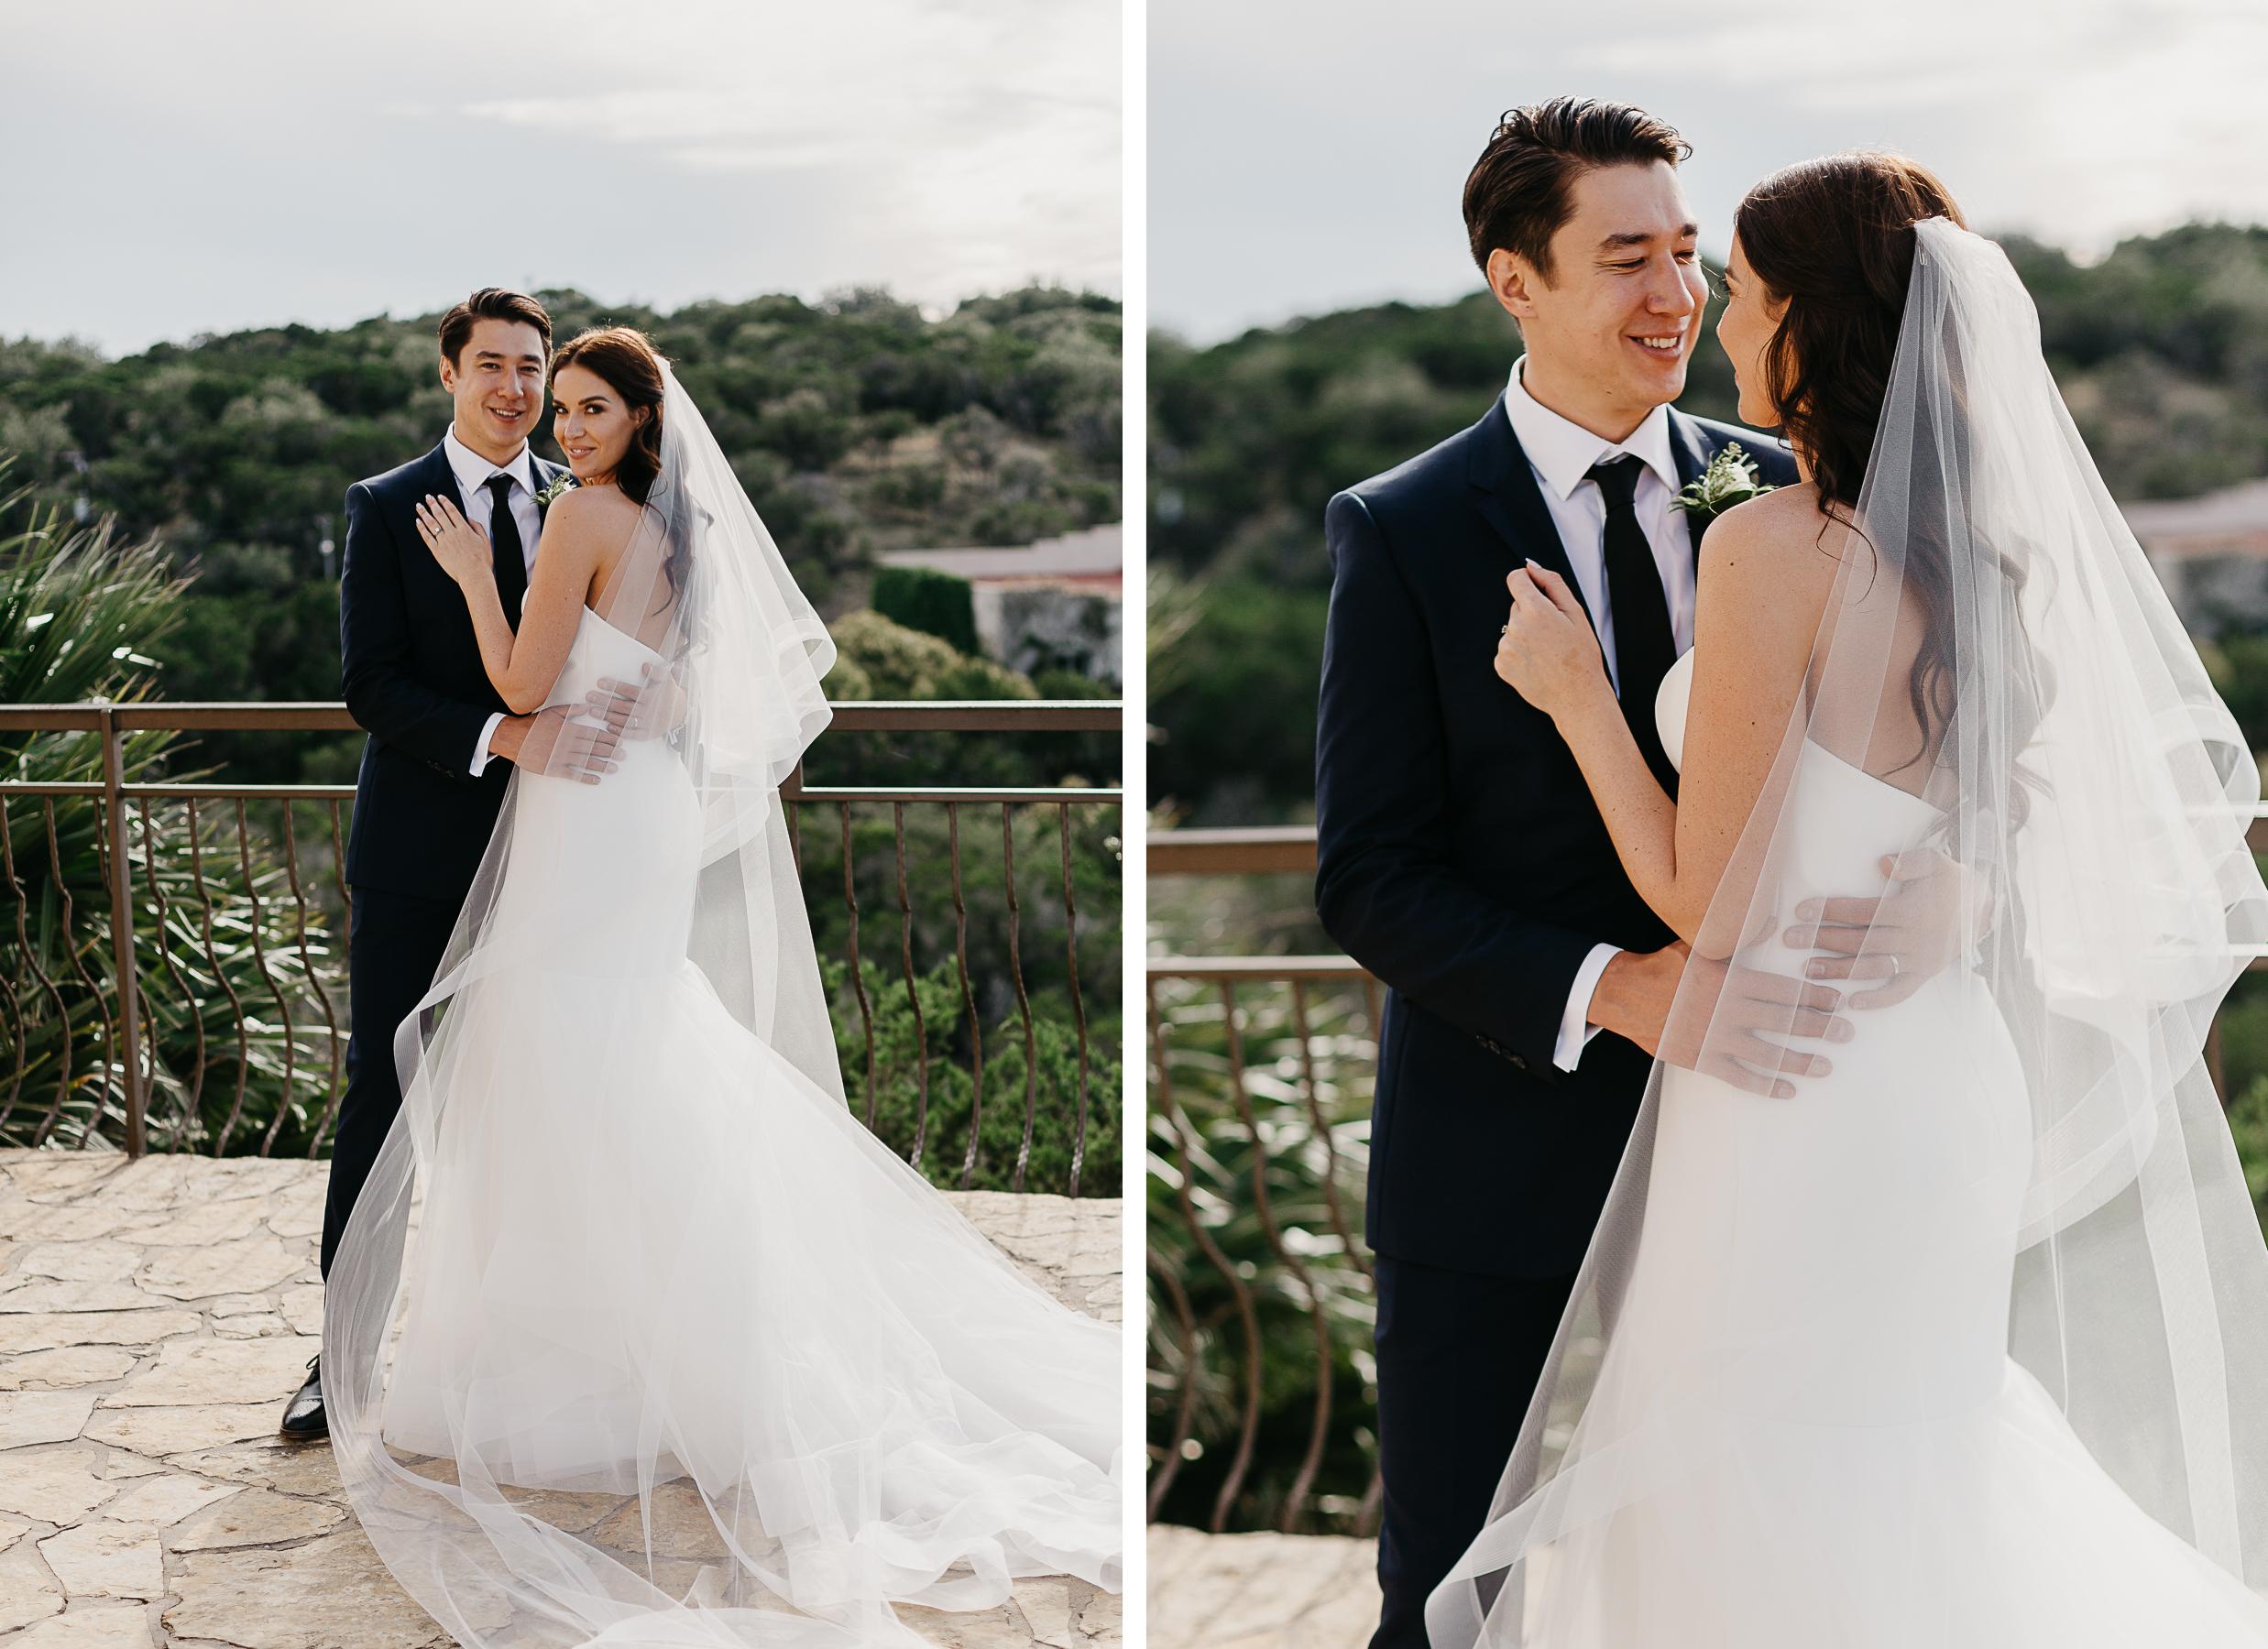 austin wedding photographer 10.jpg